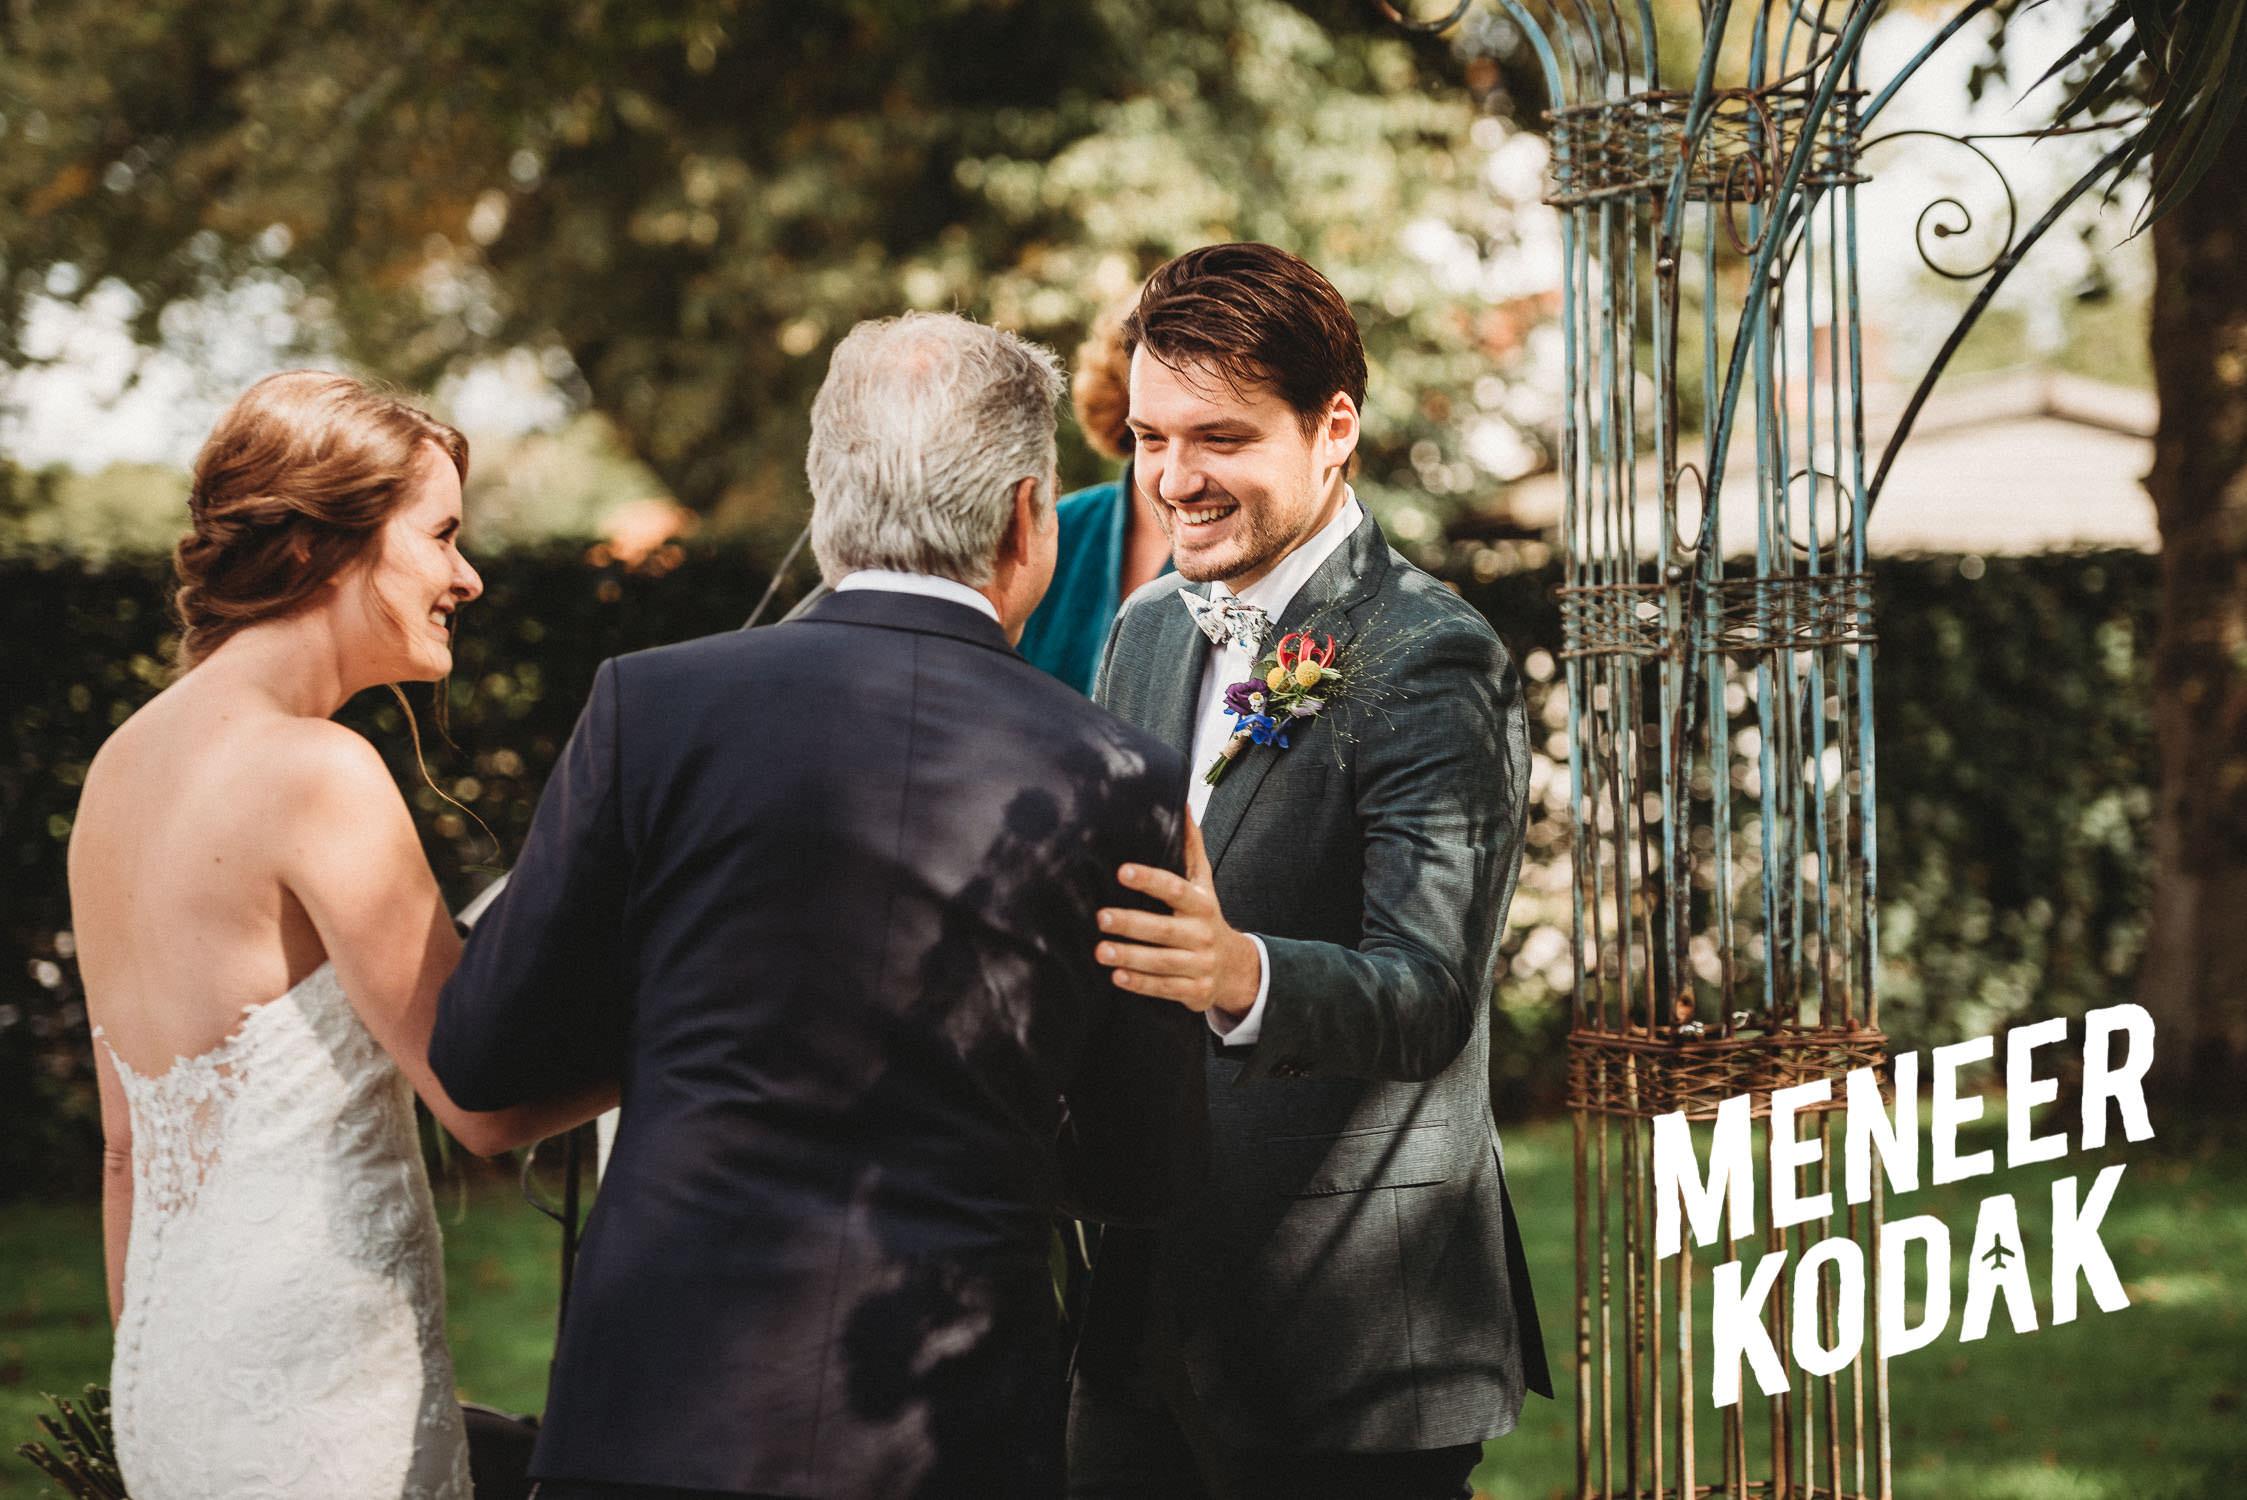 Meneer Kodak - Trouwreportage - Breda - E&M-096.jpg